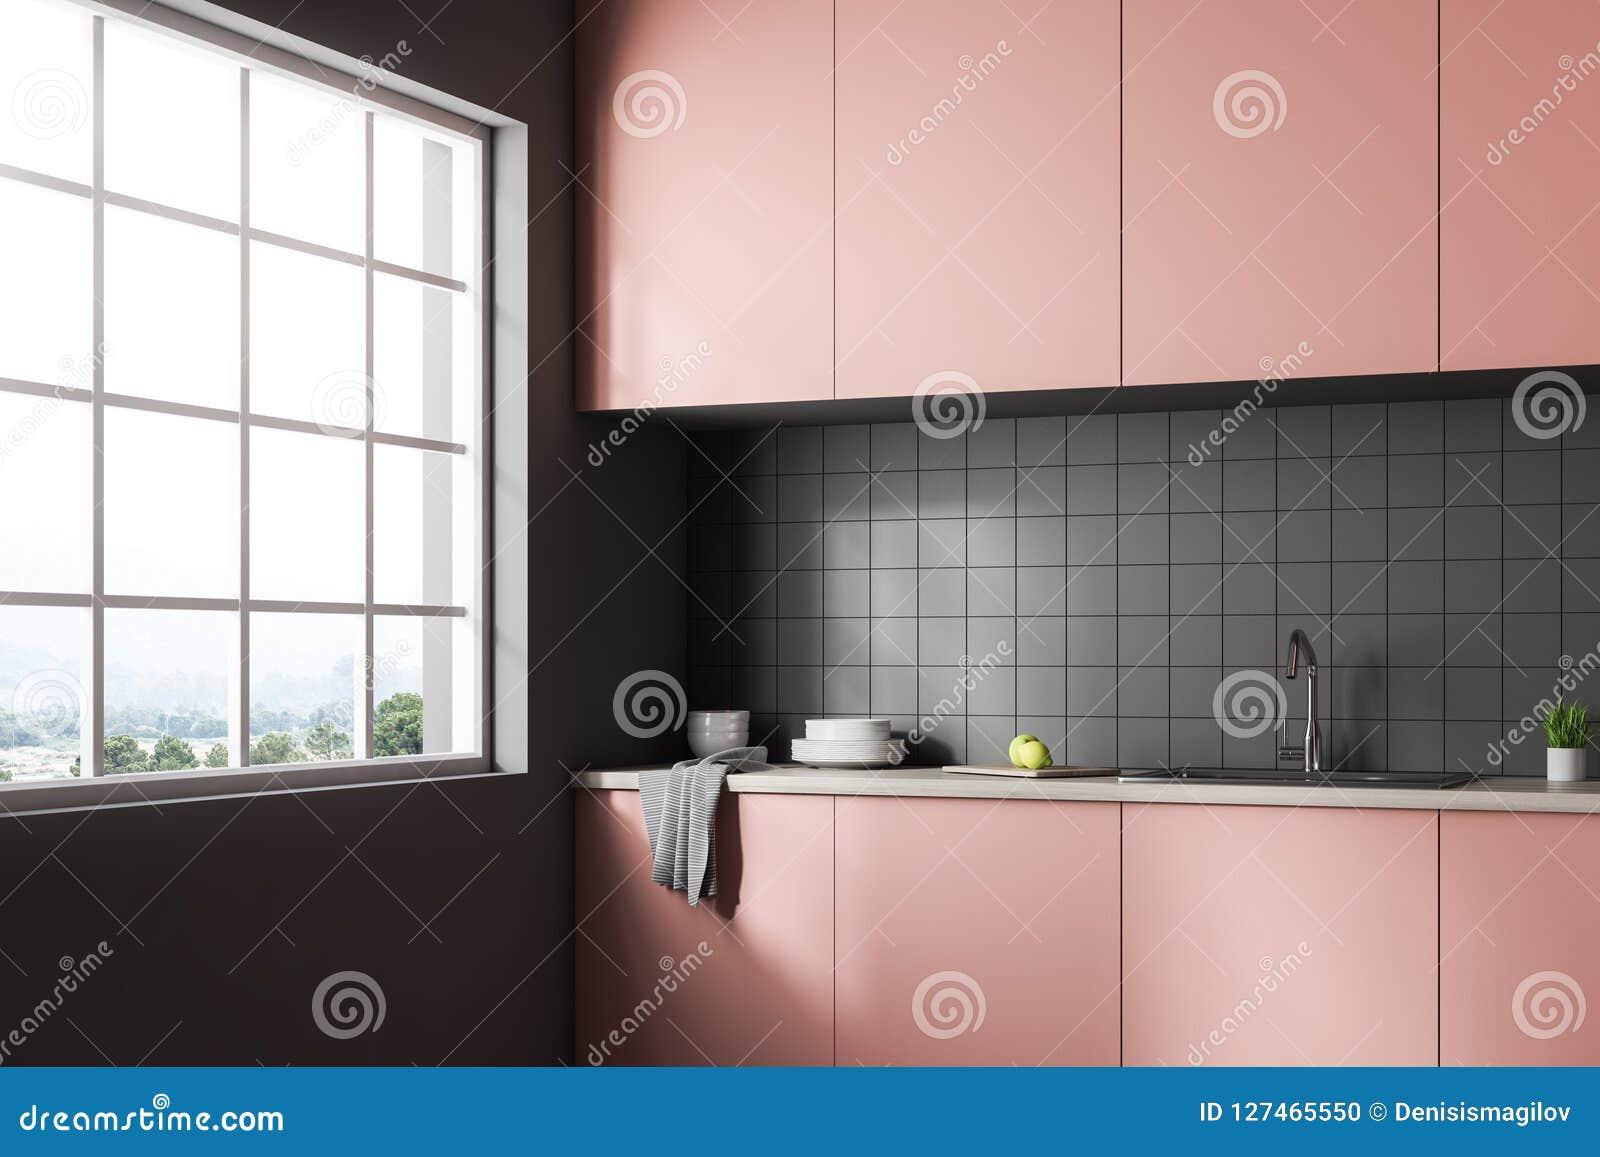 Interior Of Gray Tile Kitchen Pink Countertops Stock